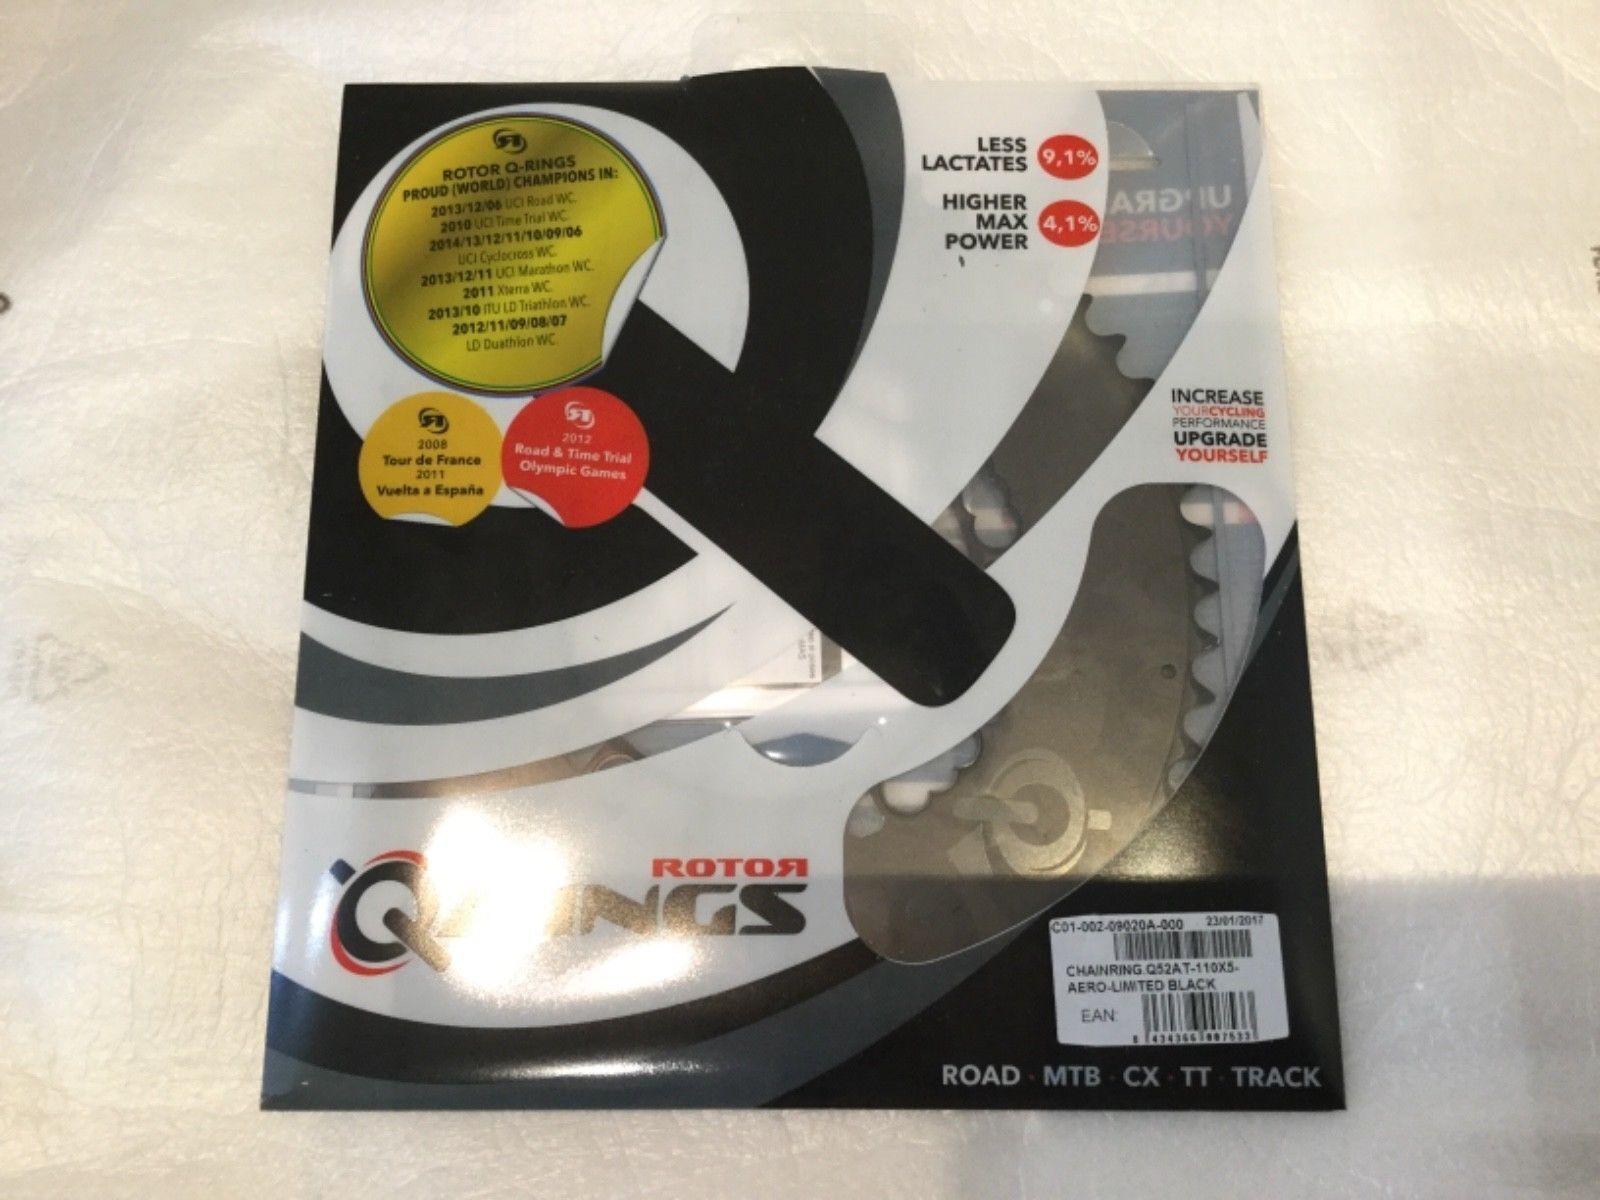 redor Aero Q ring chainring Limited Editon 52T 110 BCD x 5 Bolt NEW RRP .00